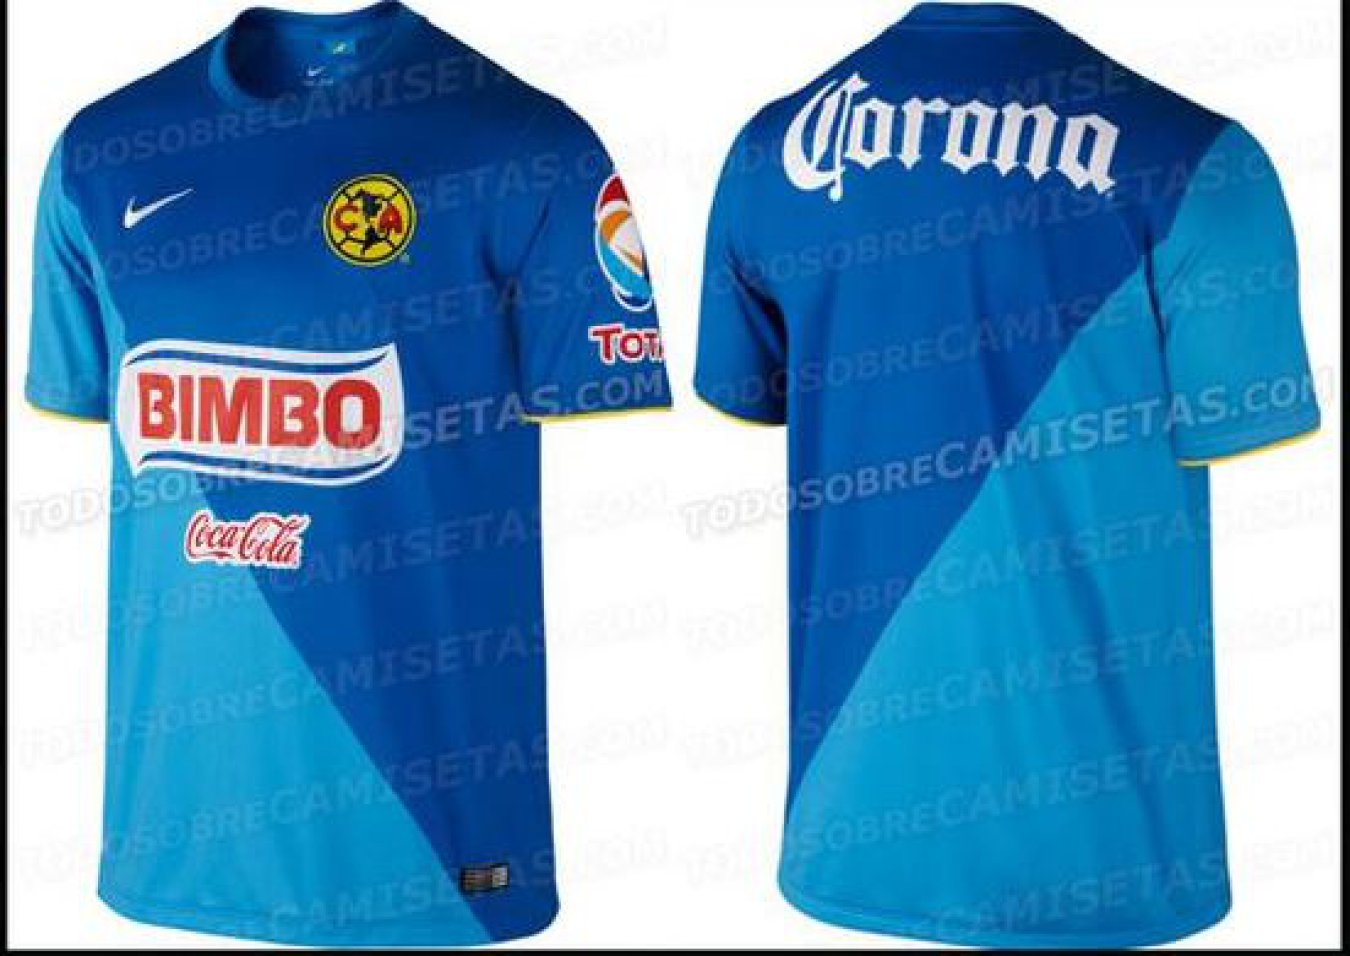 15e3f28f607 Equipos de la Liga MX que ya presentaron su tercer uniforme - AS México